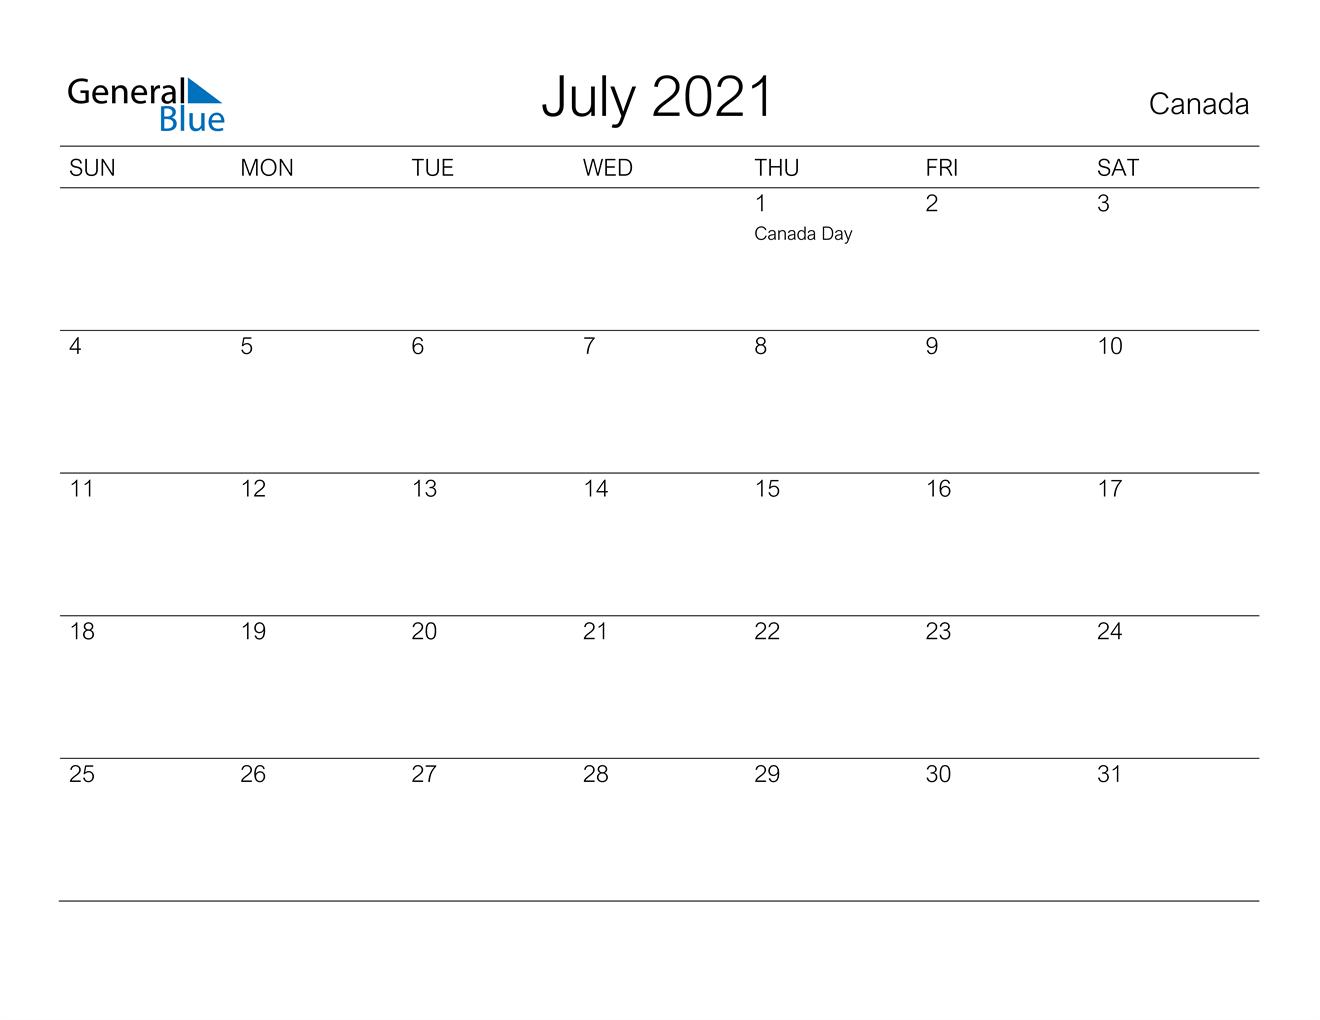 July 2021 Calendar - Canada